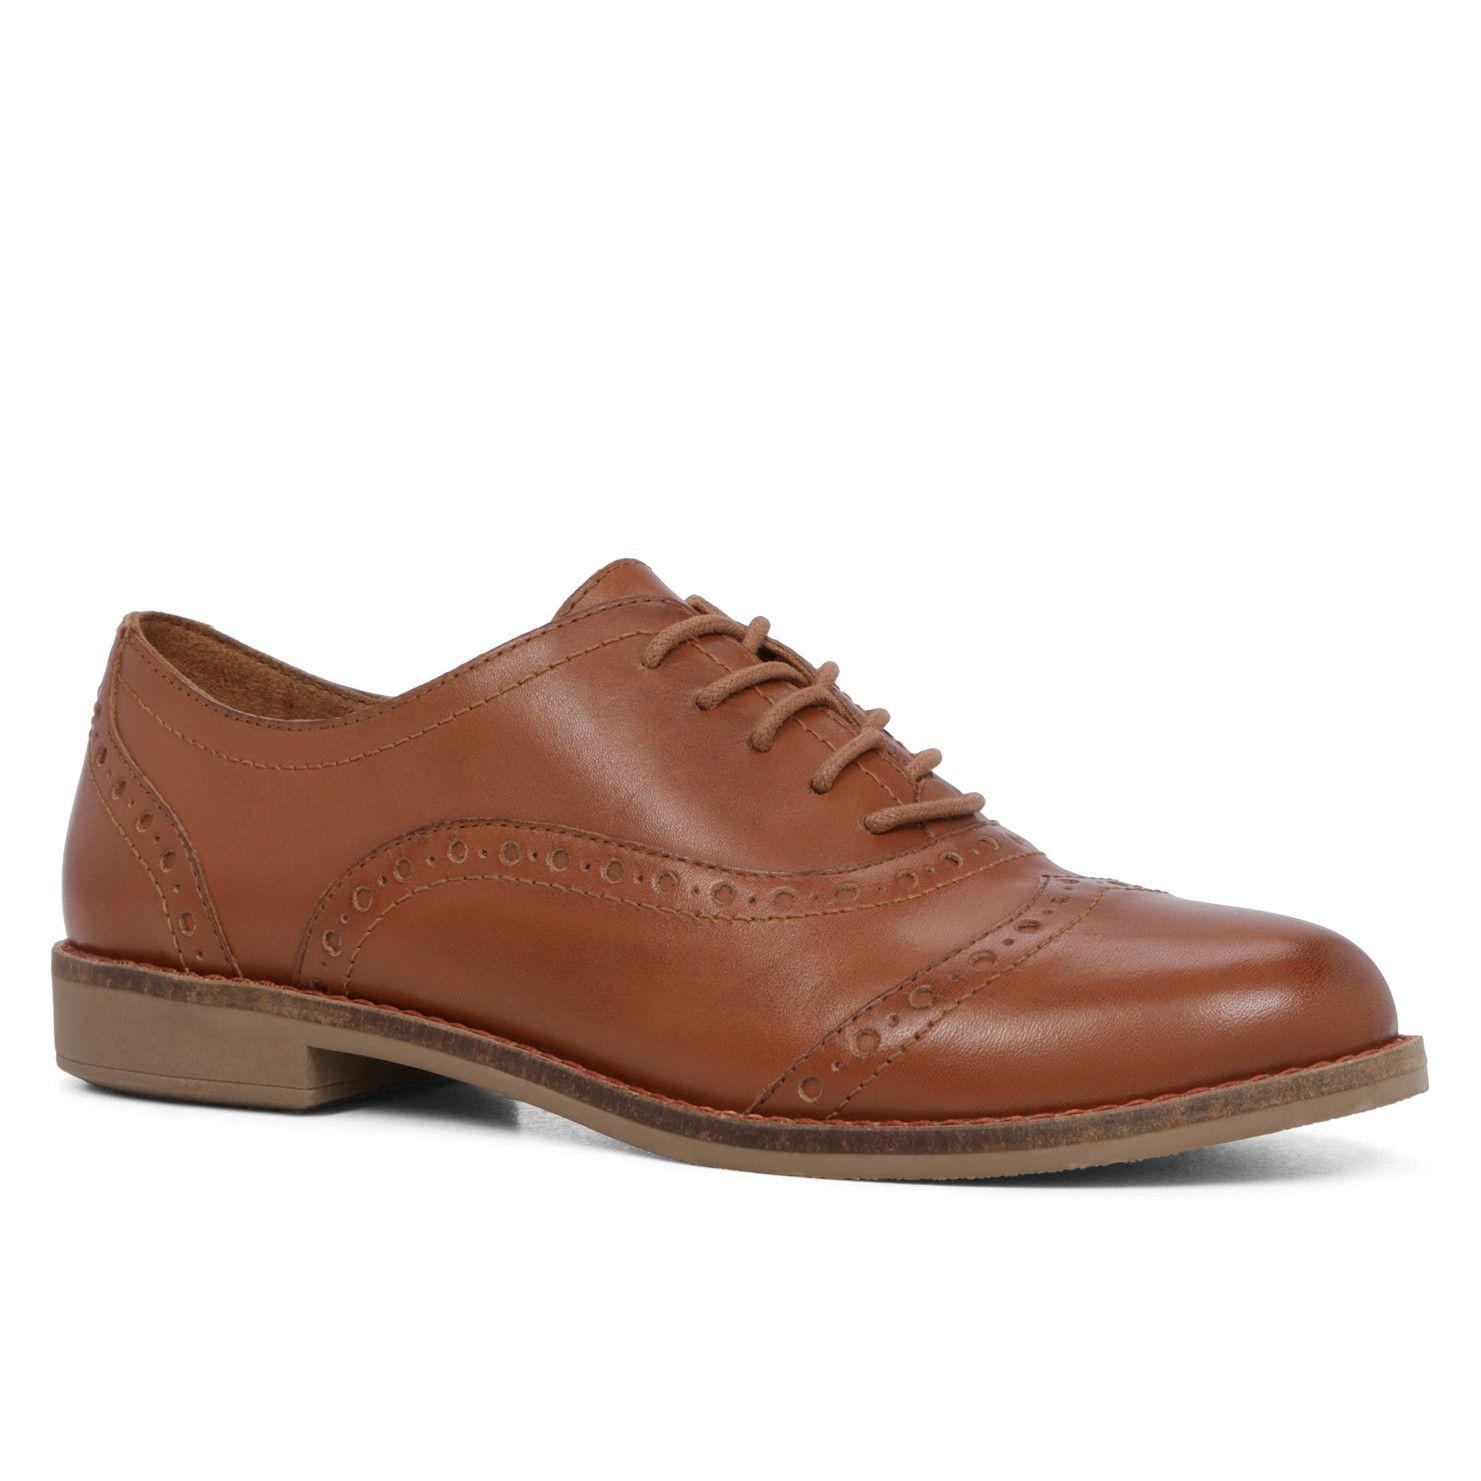 aldo shoes oxford women outfit